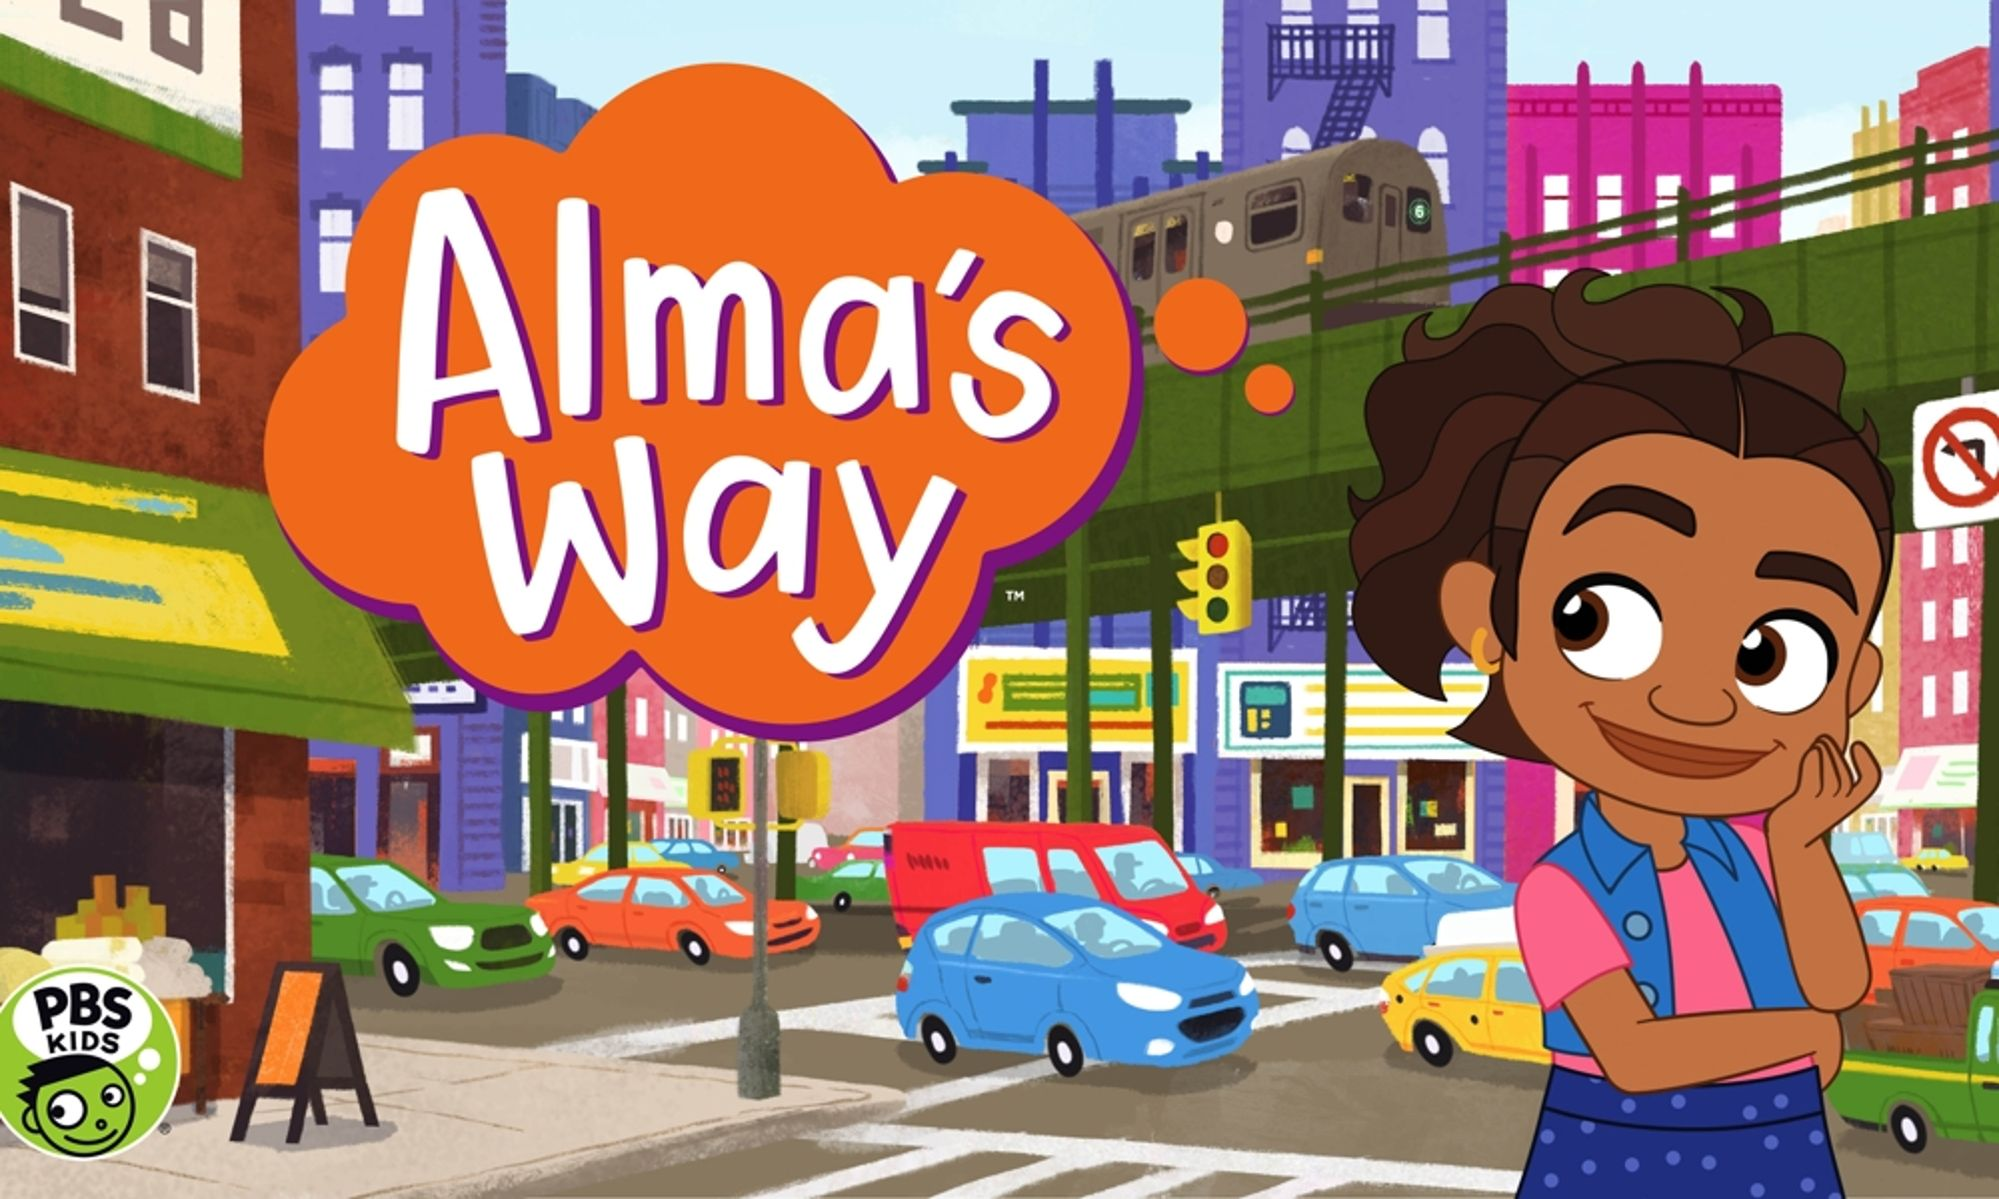 Alma's Way